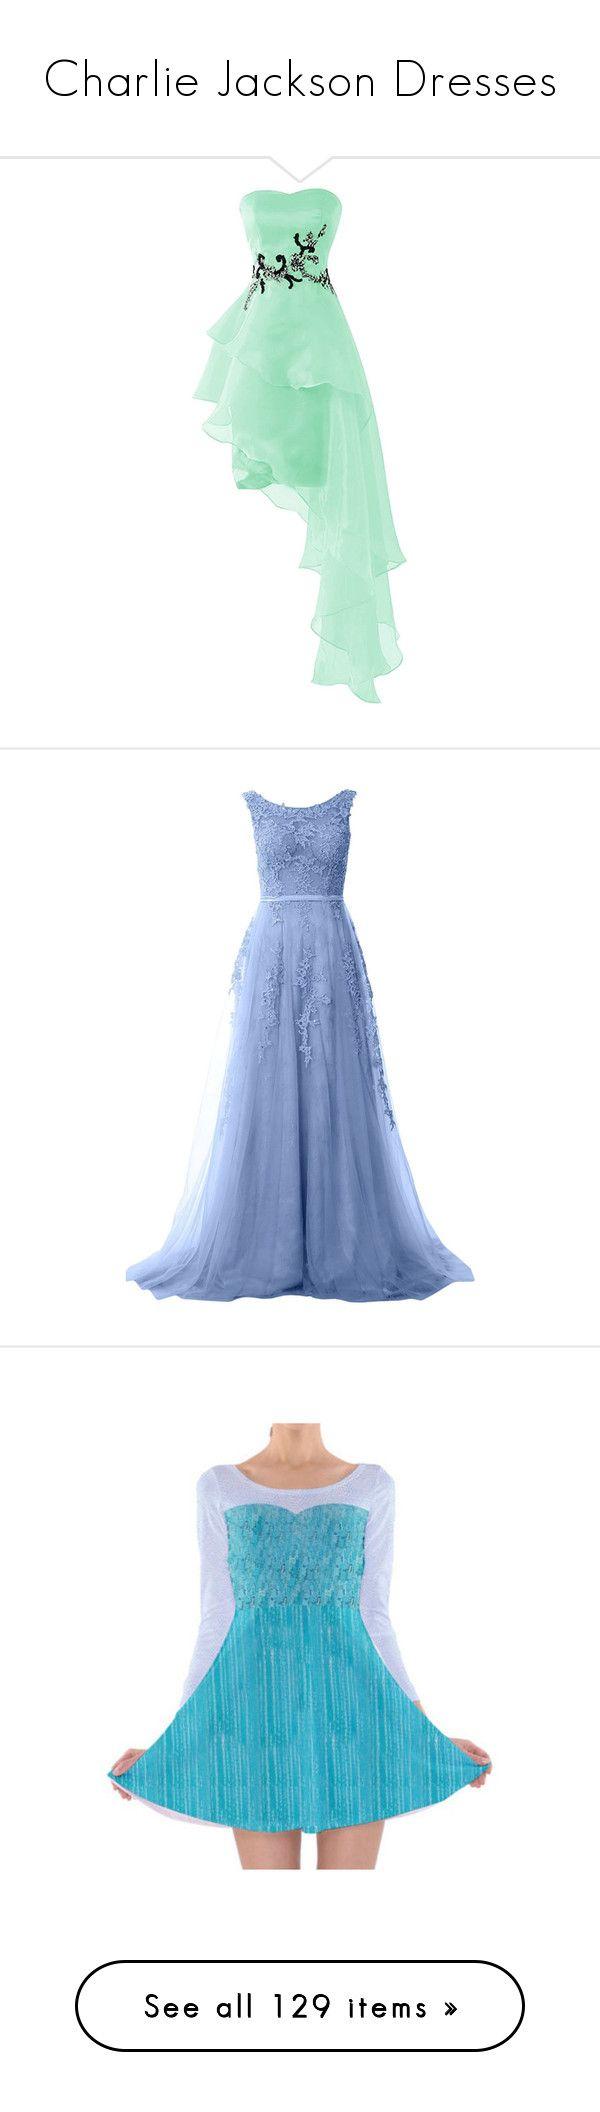 Charlie jackson dresses